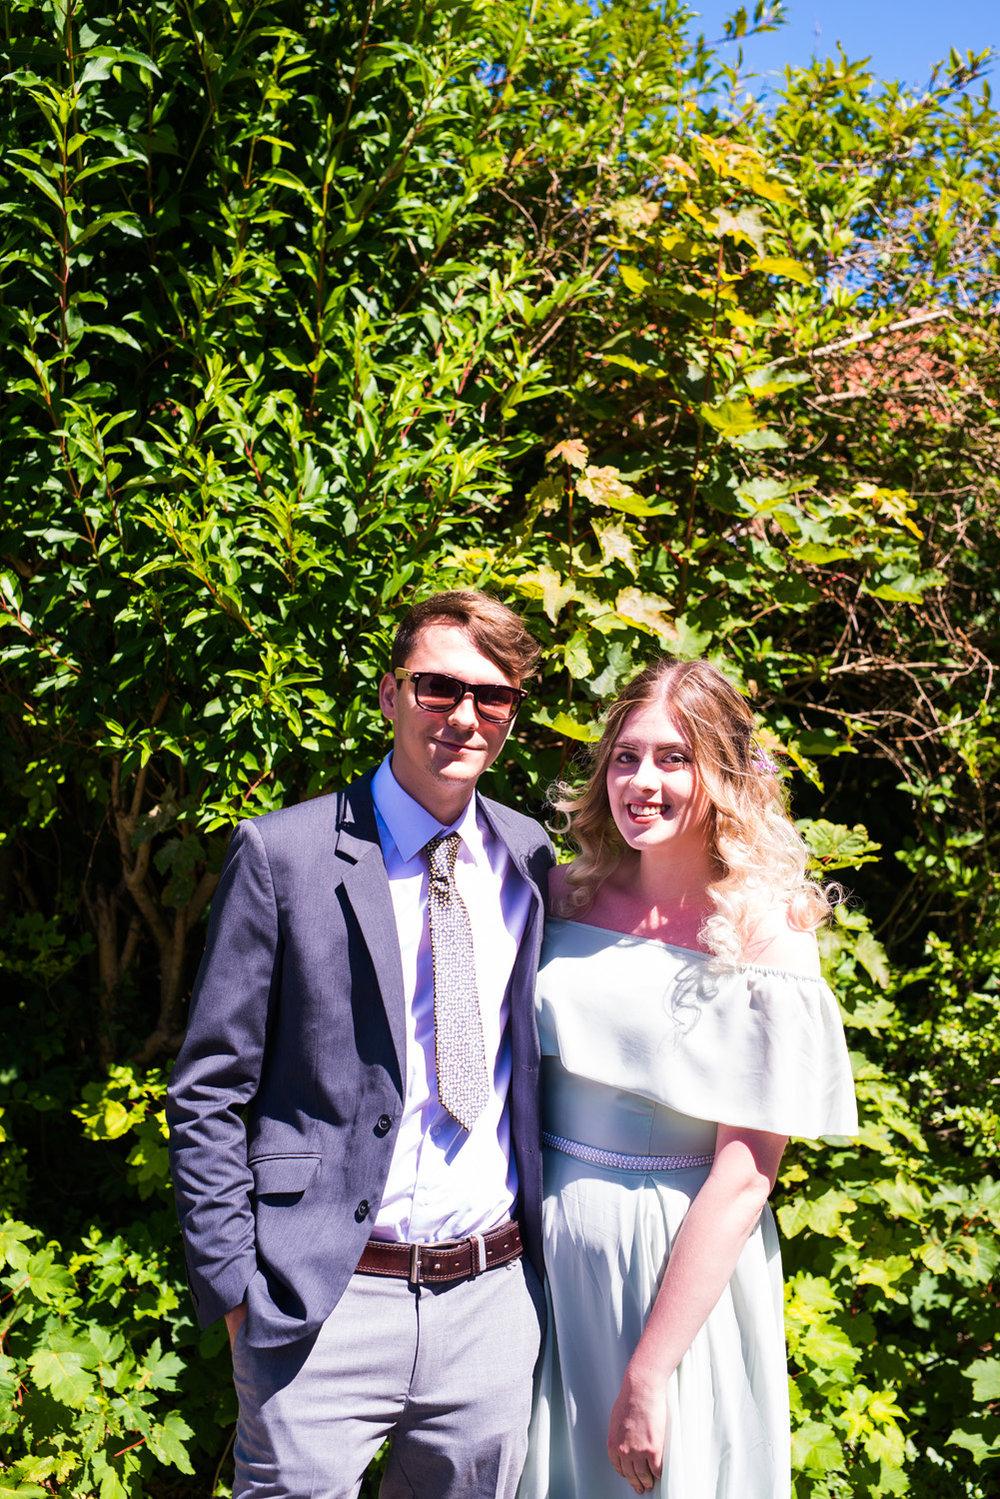 Alicja and Jake Wedding photos (45 of 245).jpg